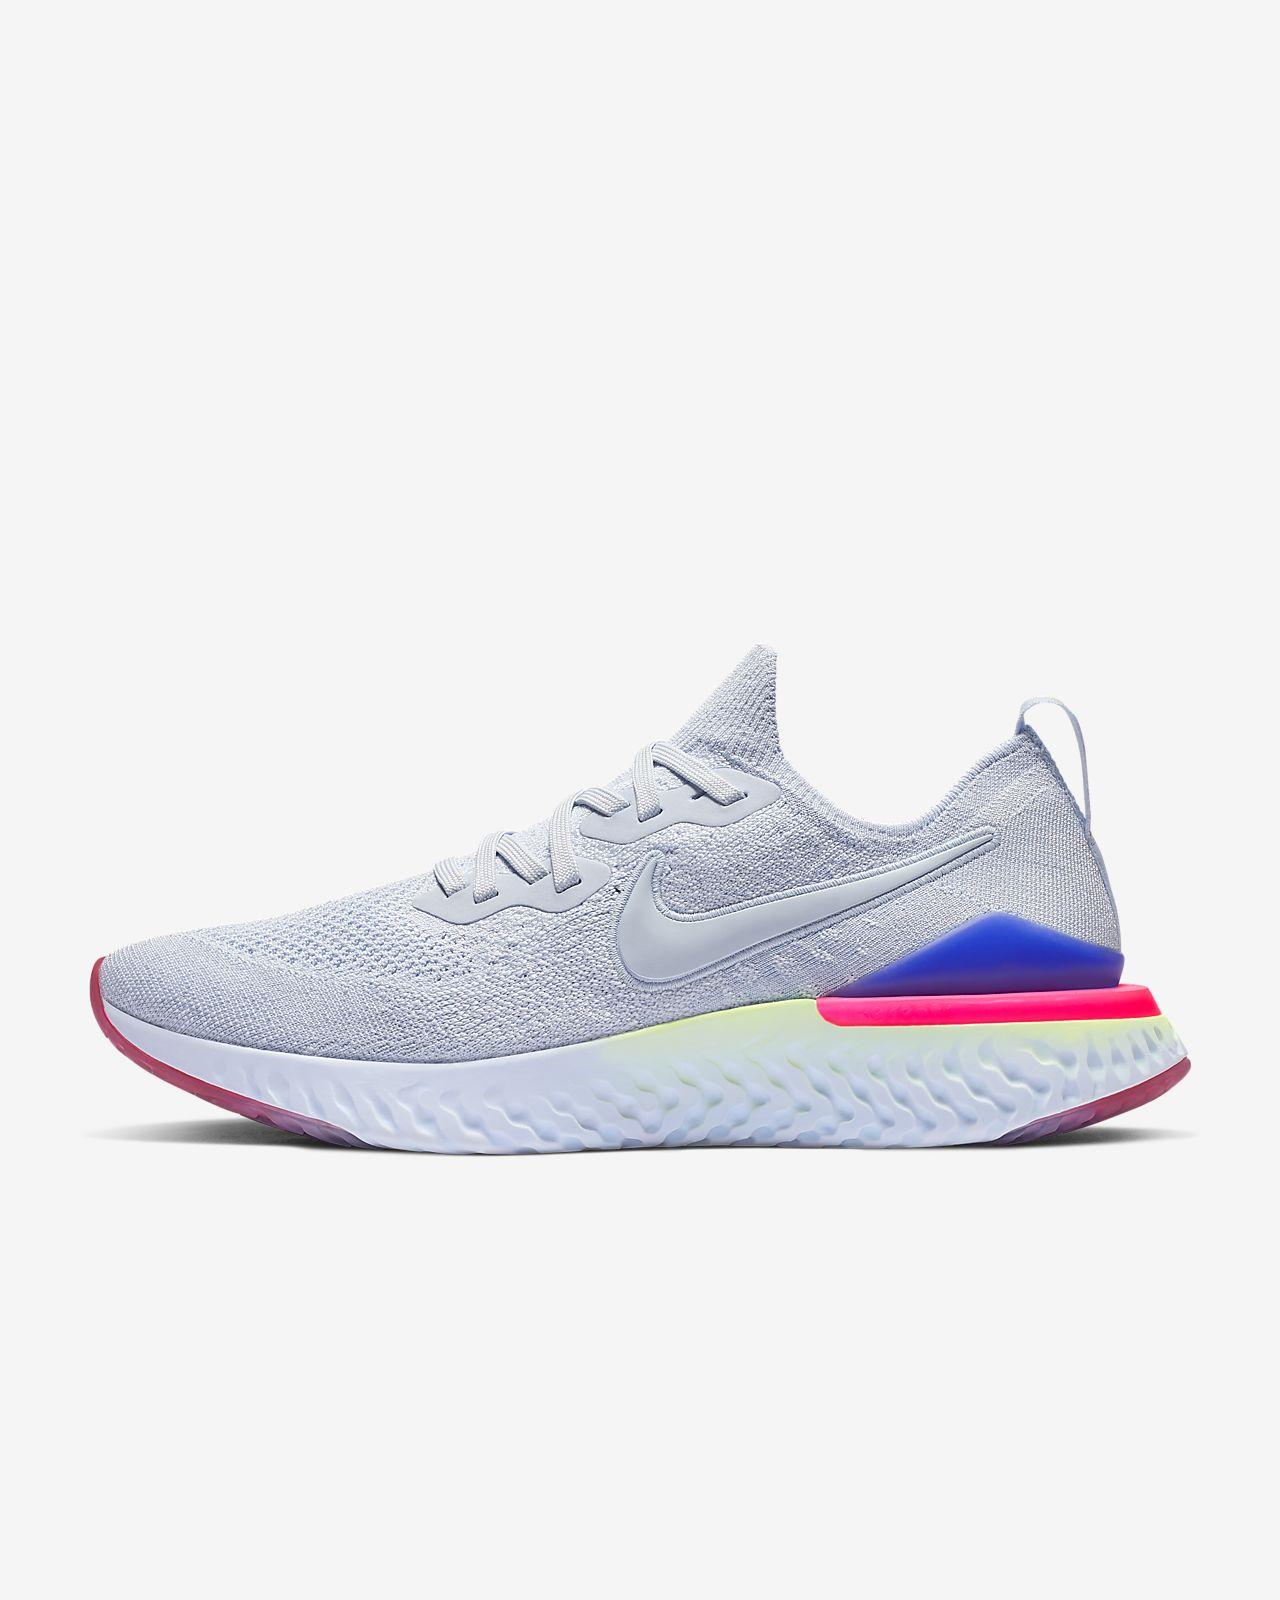 De Running Es Mujer Nike Xiy4wgq Epic Zapatillas React Flyknit 2 OkXZiuP